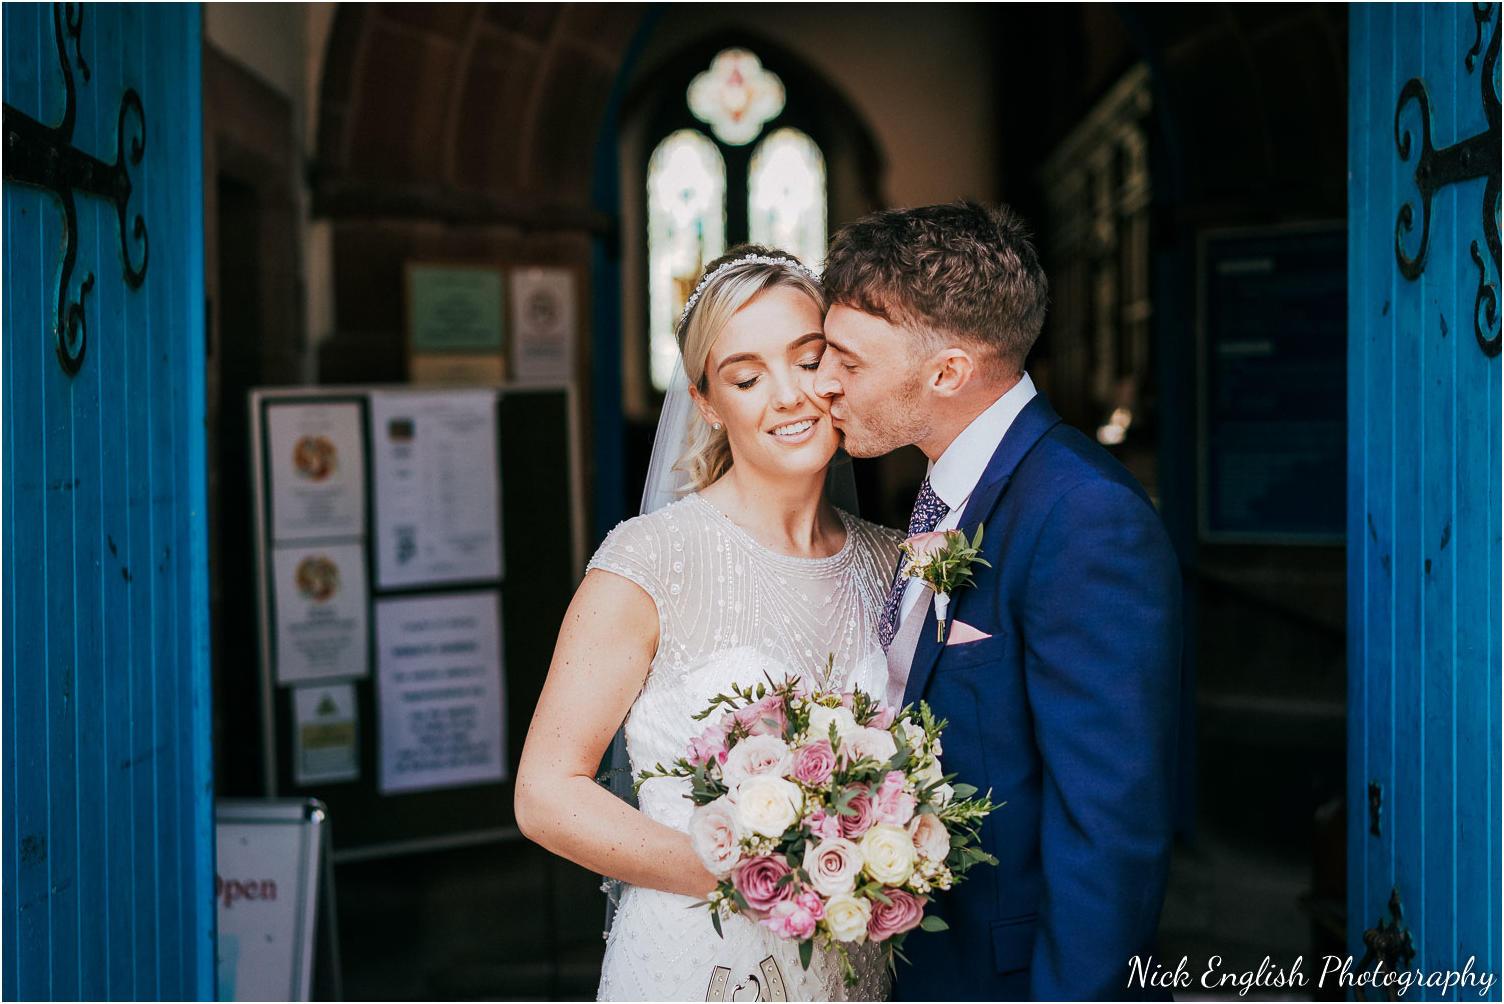 Mitton_Hall_Wedding_Photograph-51.jpg